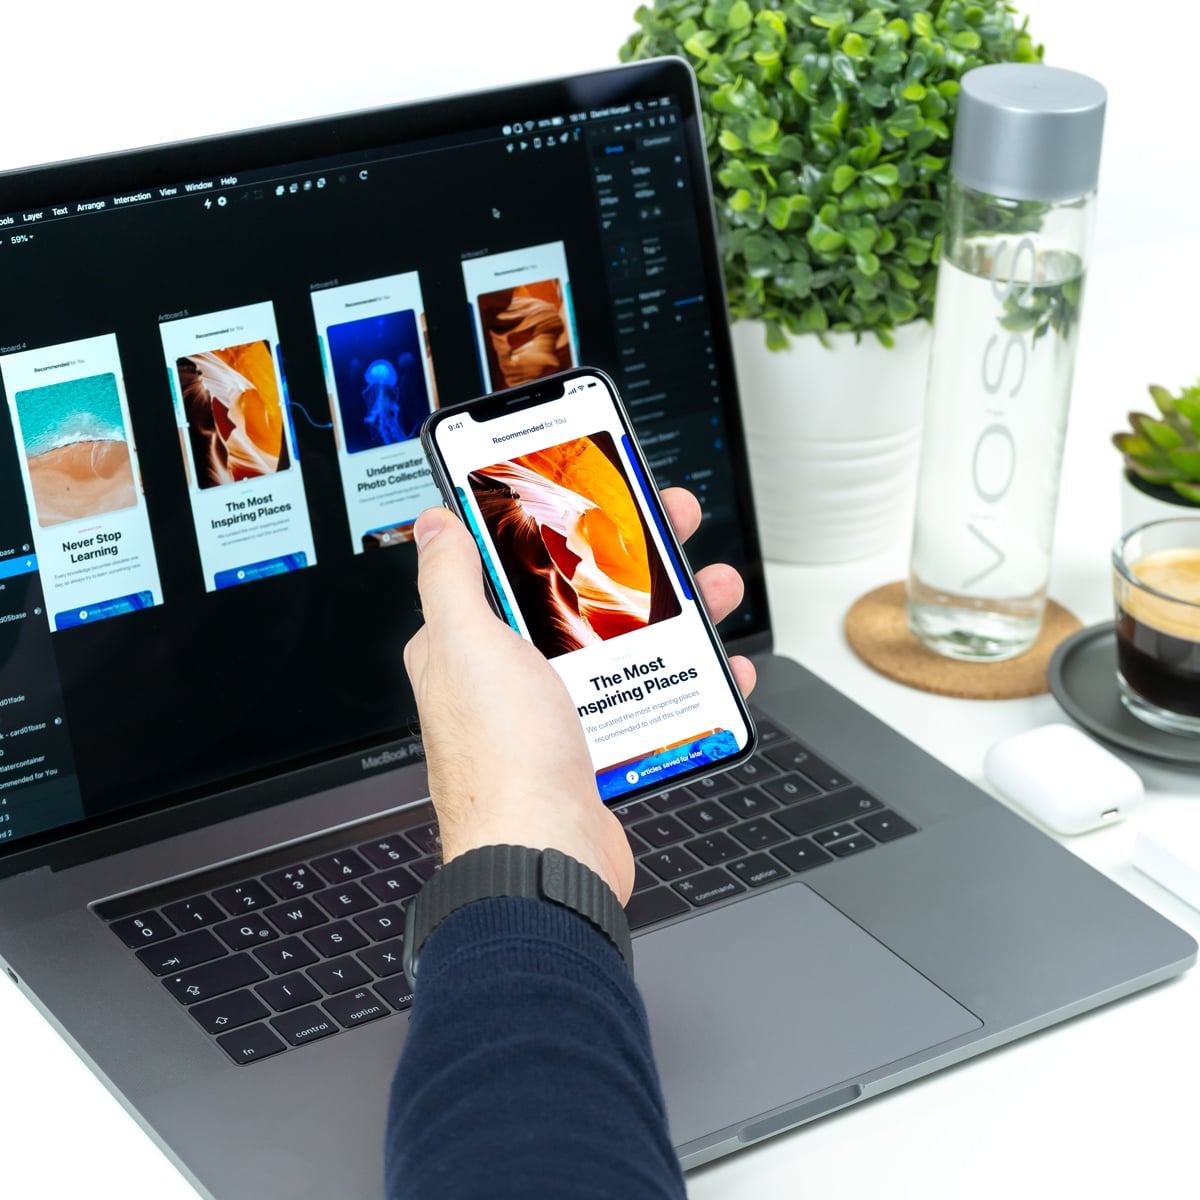 UI designer designer the interface of an app using a UI design tool